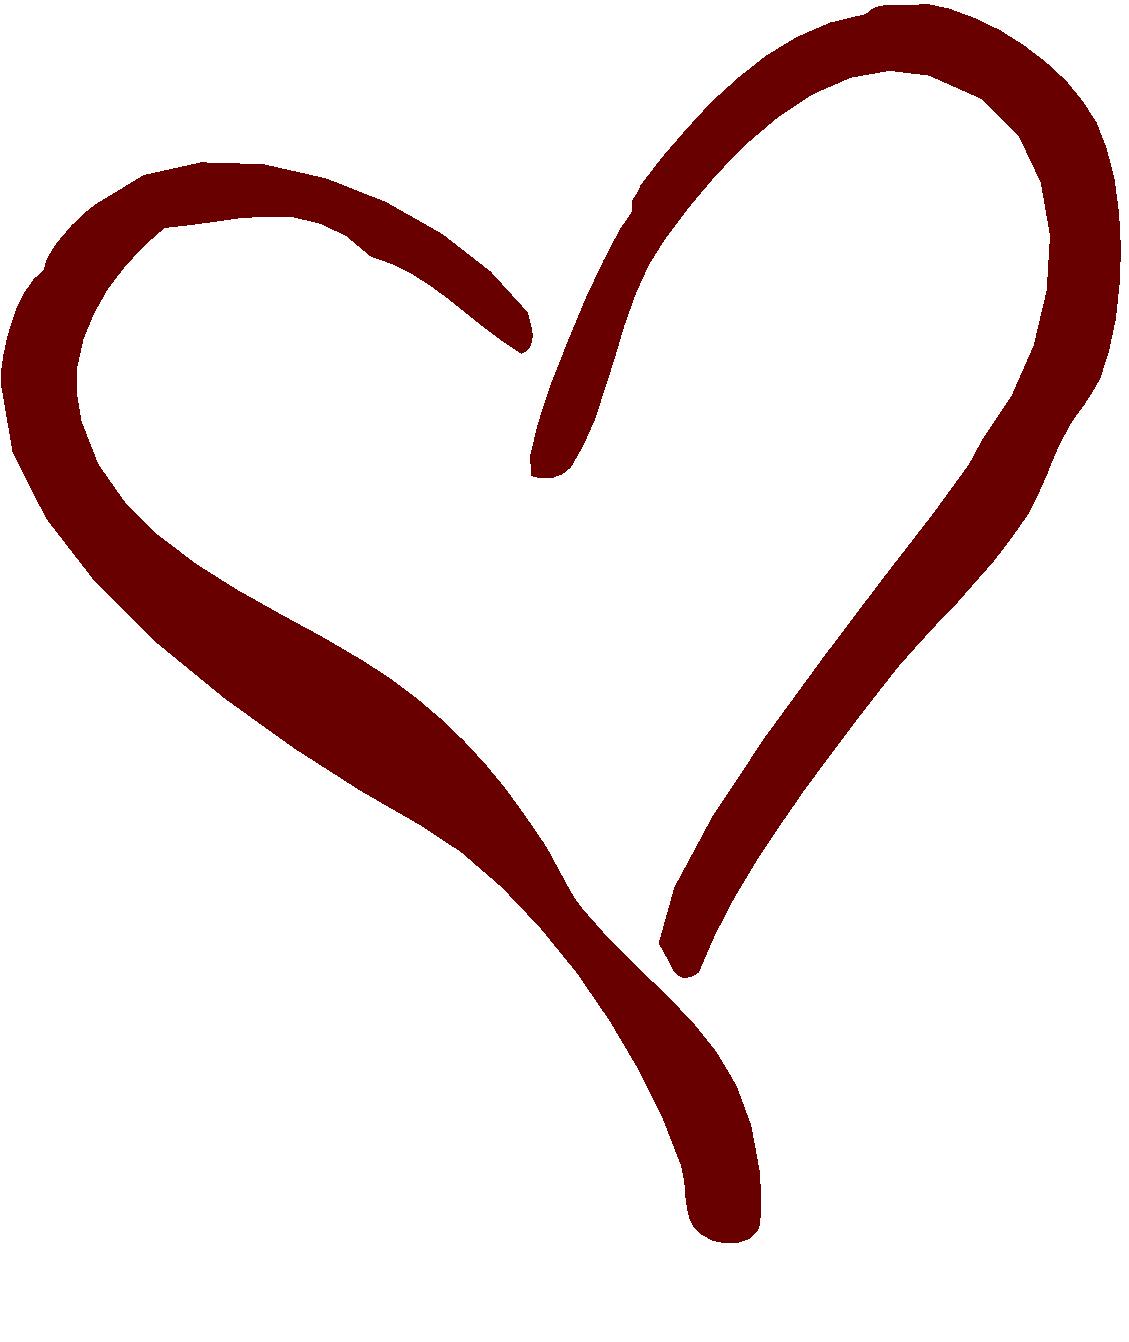 1129x1342 Heart Clipart Free Clip Art Of Hearts Clipart Clipart 3